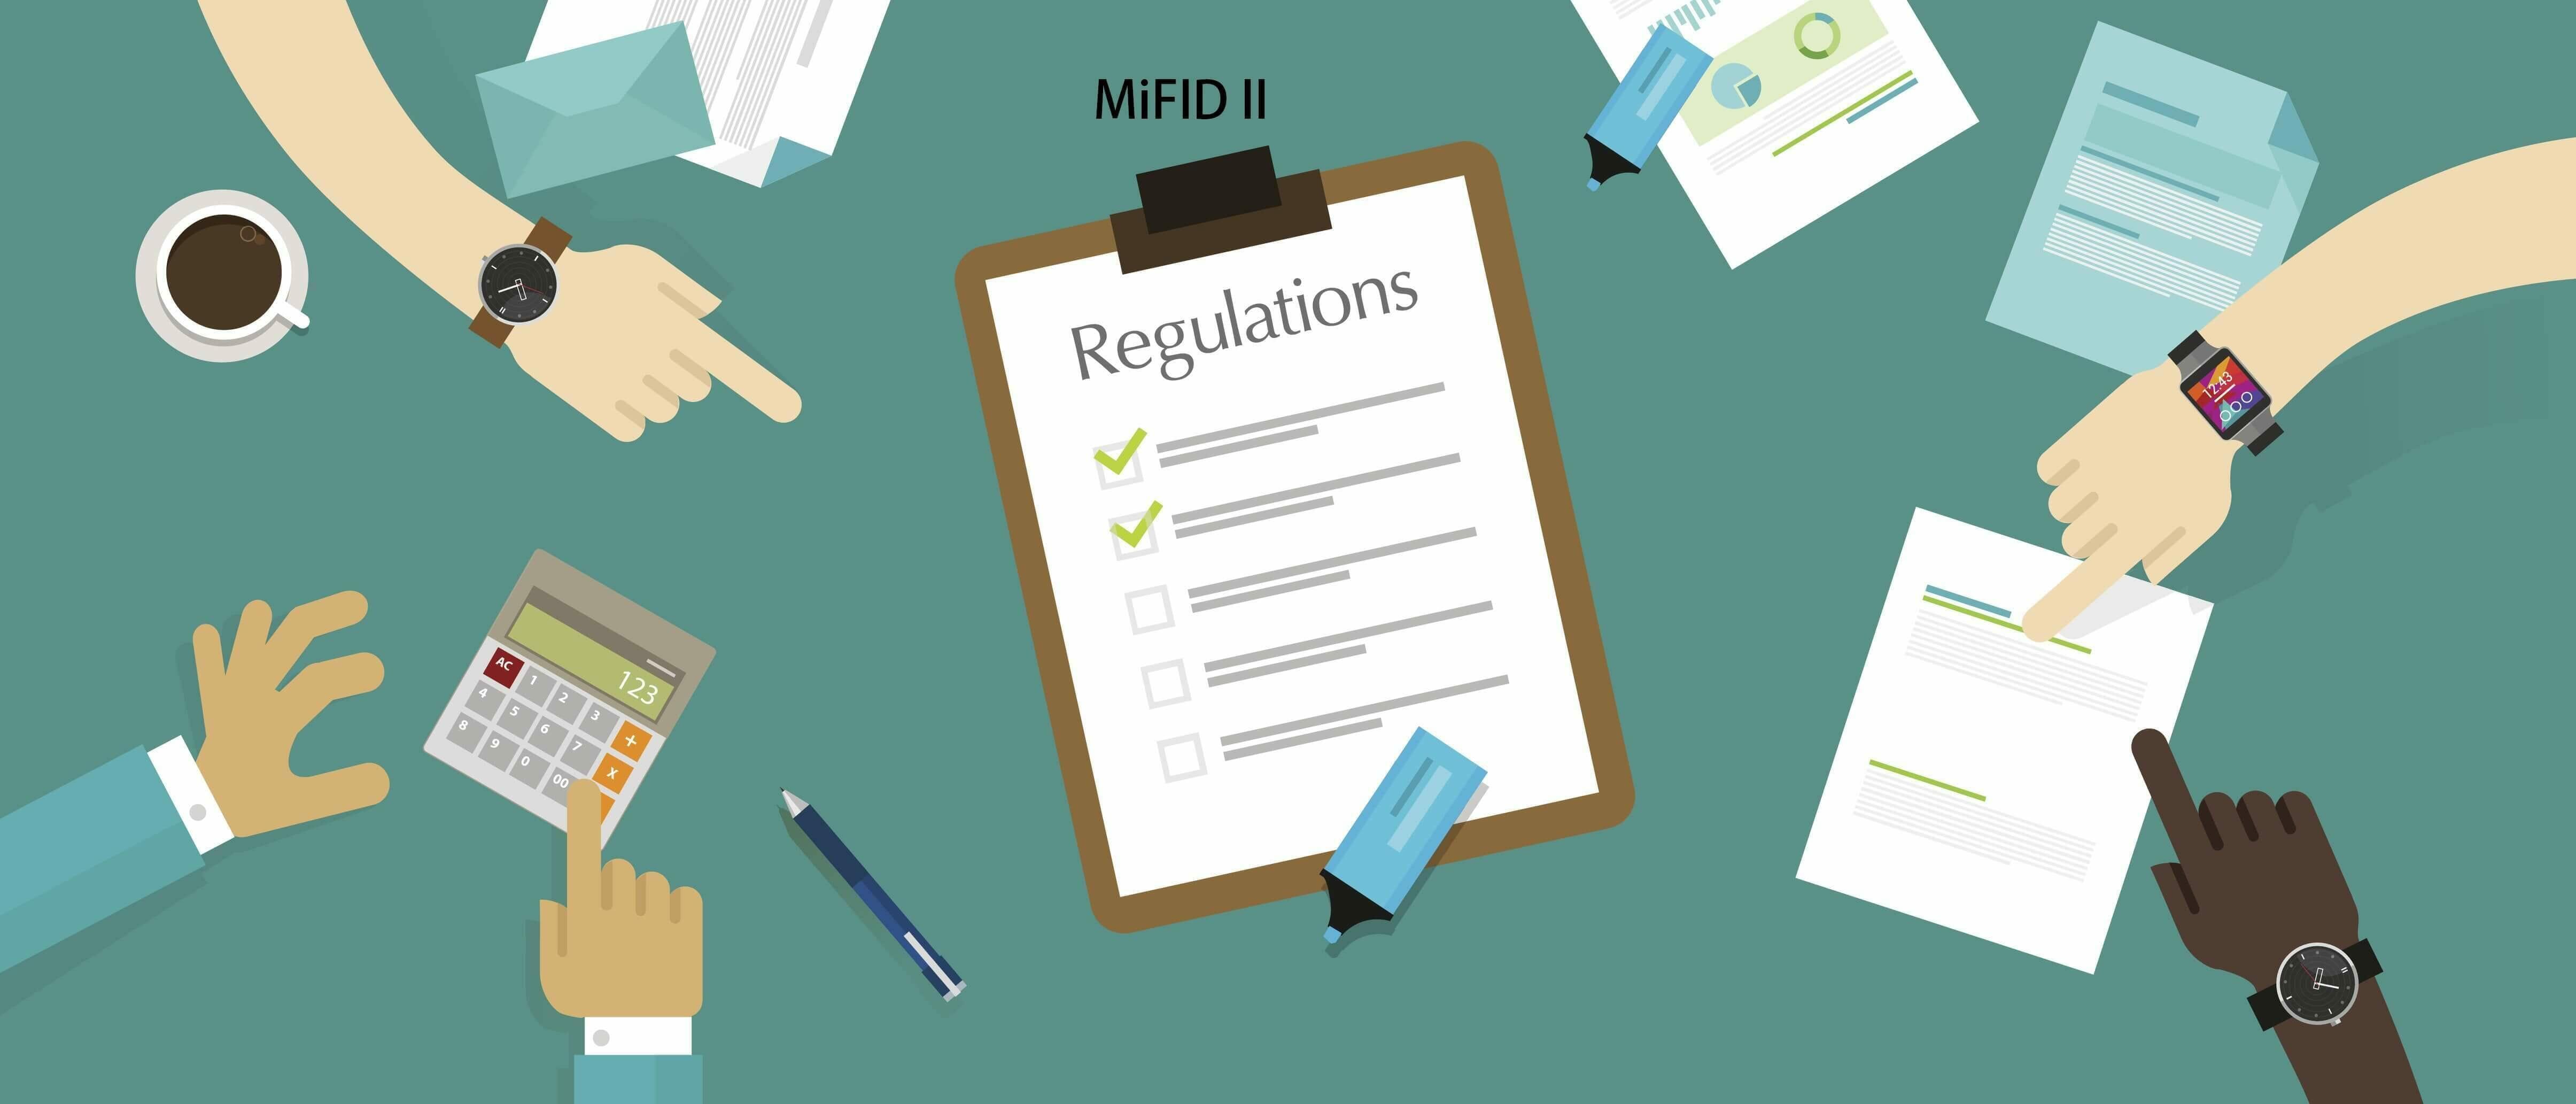 Mobile Voice recording – MiFID II